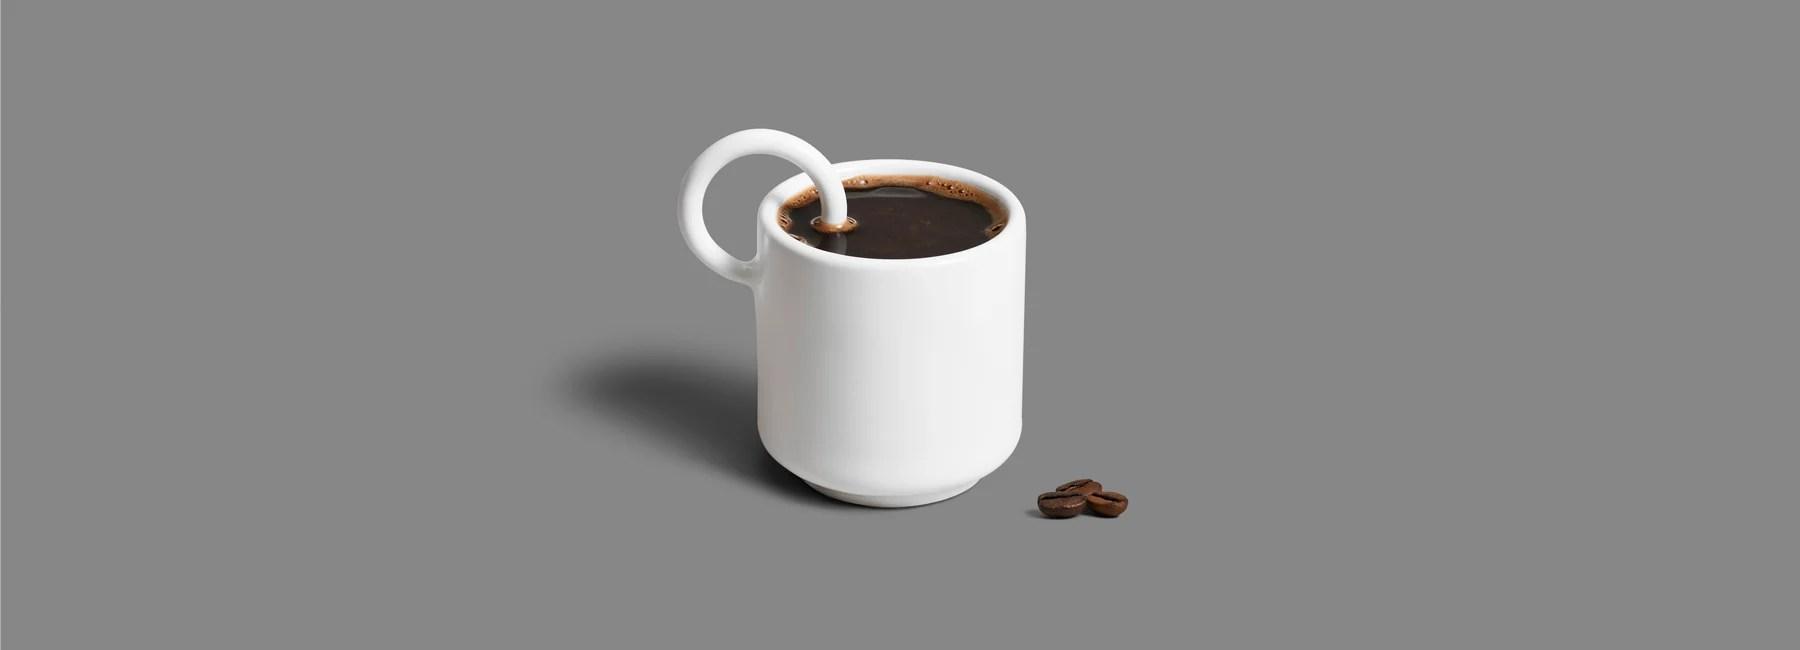 Smart Printed Porcelain Coffee Cup Is A Nod To Culture Mugs Design Body Art Coffee Cups Art News 3d Coffee Mug Photoshop 3d Coffee Mug Model furniture 3d Coffee Mug